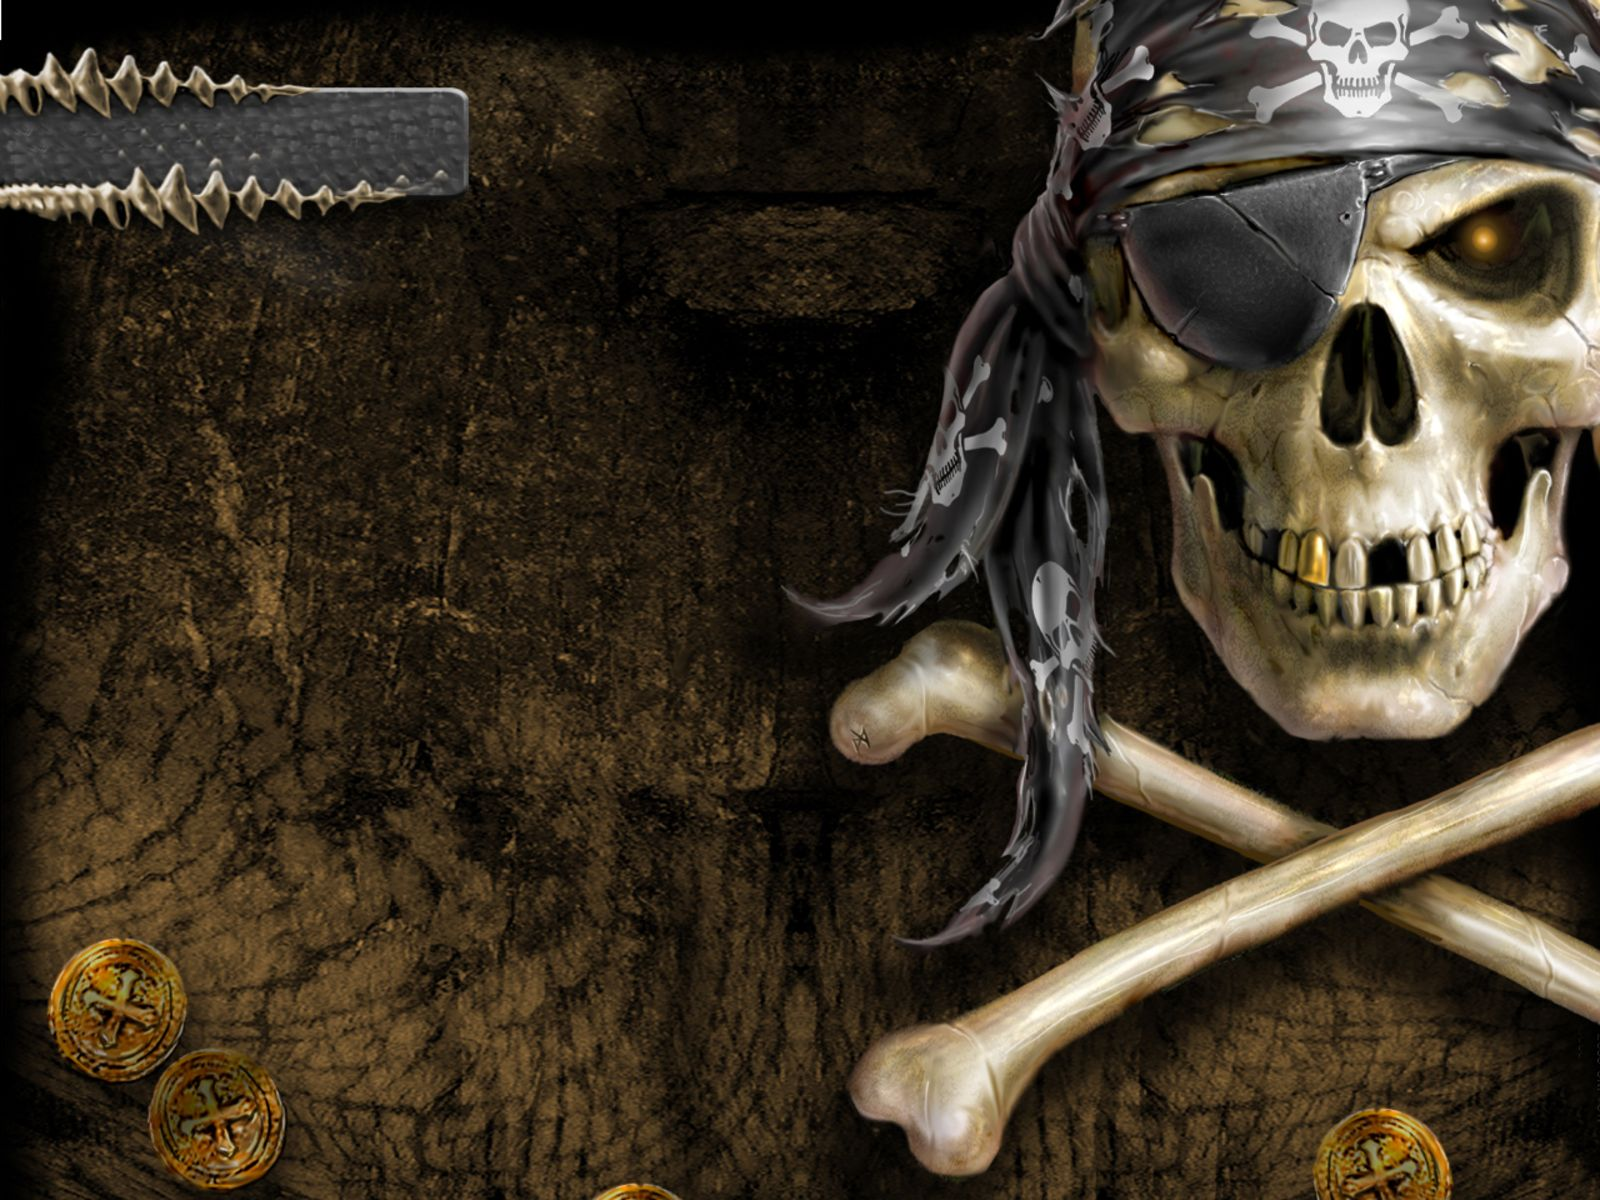 Fantasy pirate art fantasy pirate wallpaper my fantasy world fantasy pirate art fantasy pirate wallpaper voltagebd Gallery